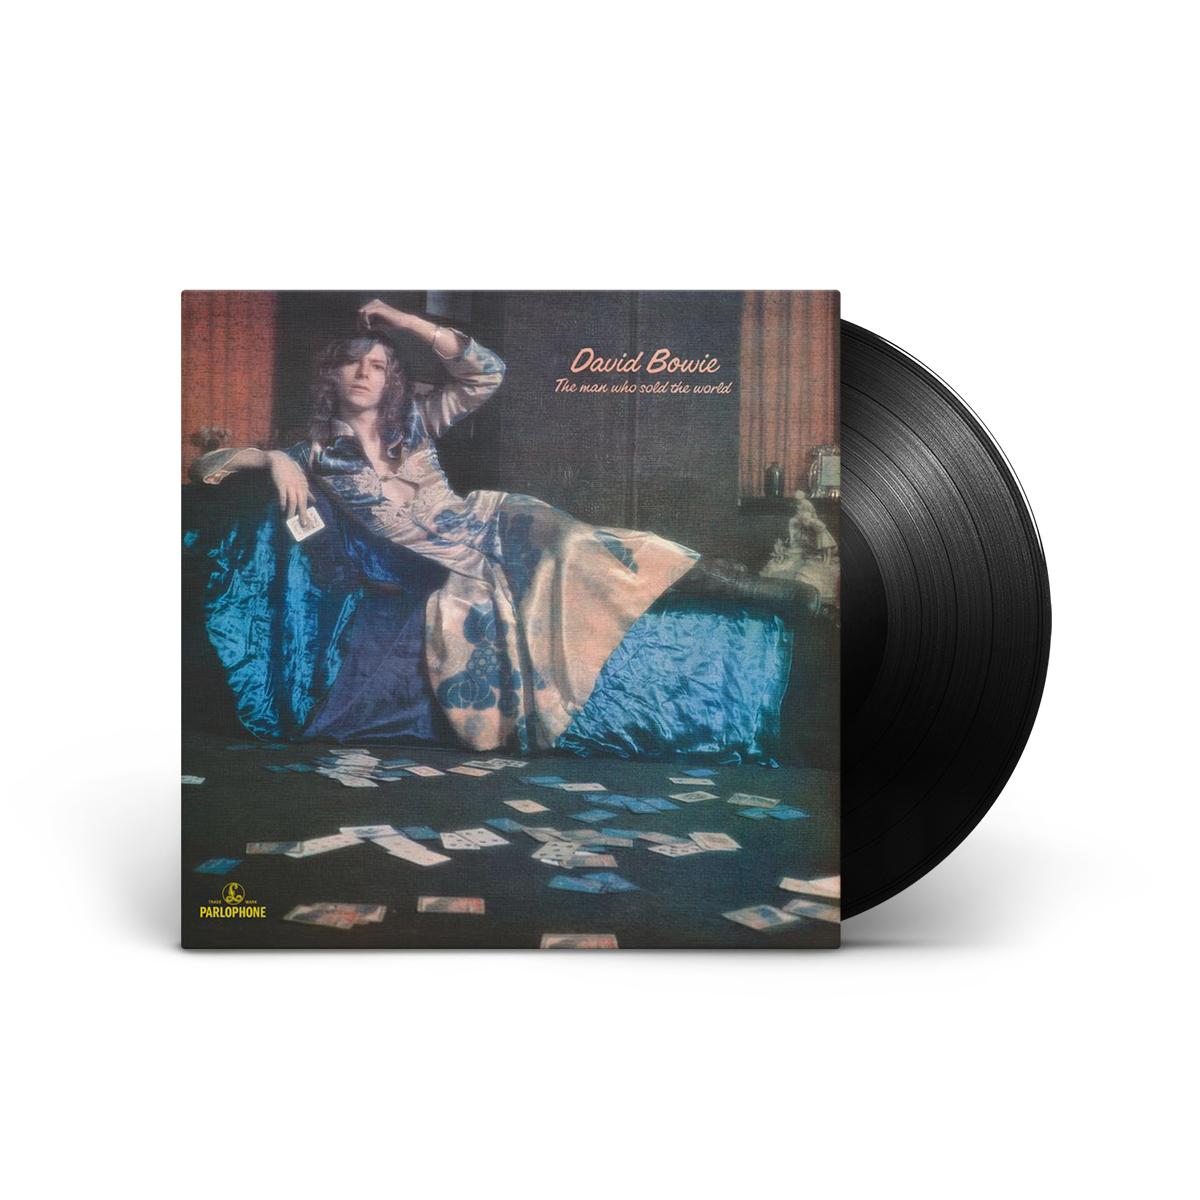 David Bowie The Man Who Sold The World (180 Gram Vinyl) LP